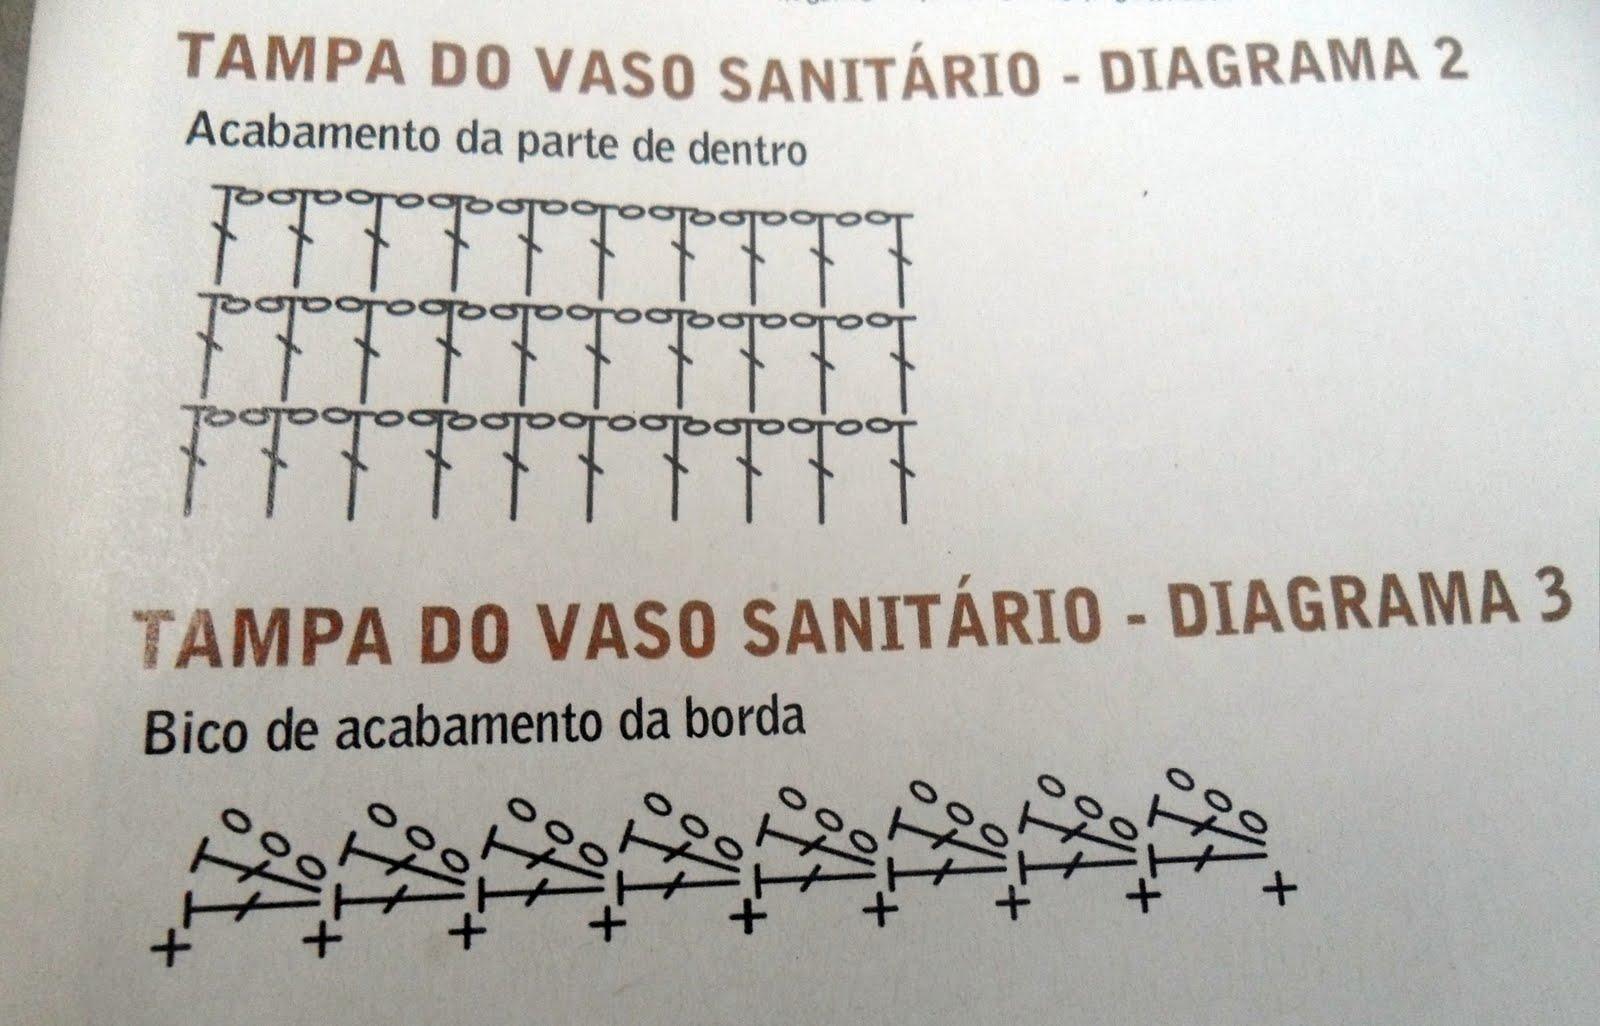 DIDA CROCHÊS: GRAFICO DA TAMPA DO VASO SANITÁRIO #654334 1600 1026